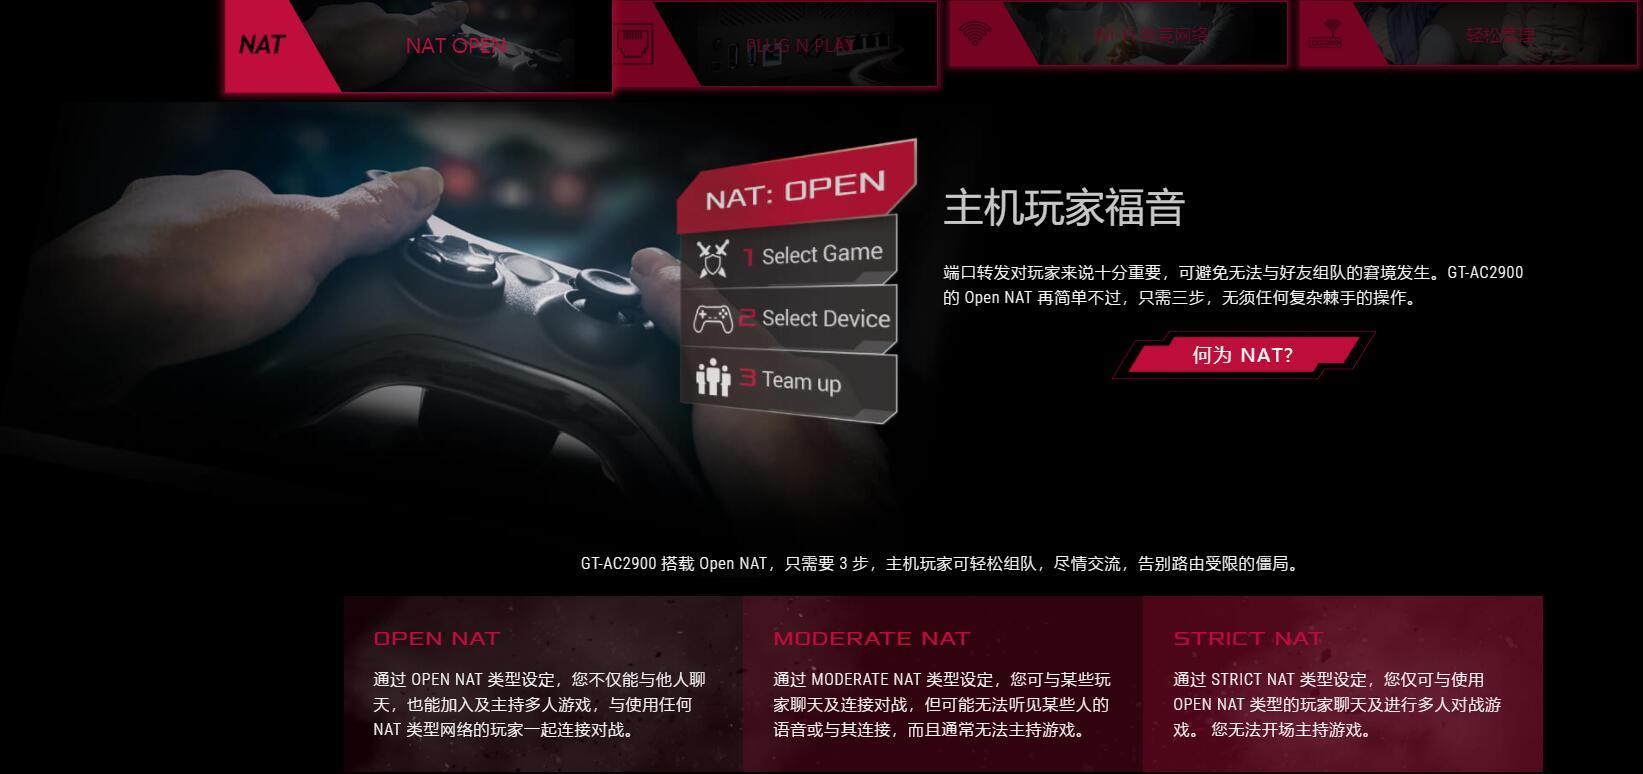 GT-AC2900 搭载 Open NAT